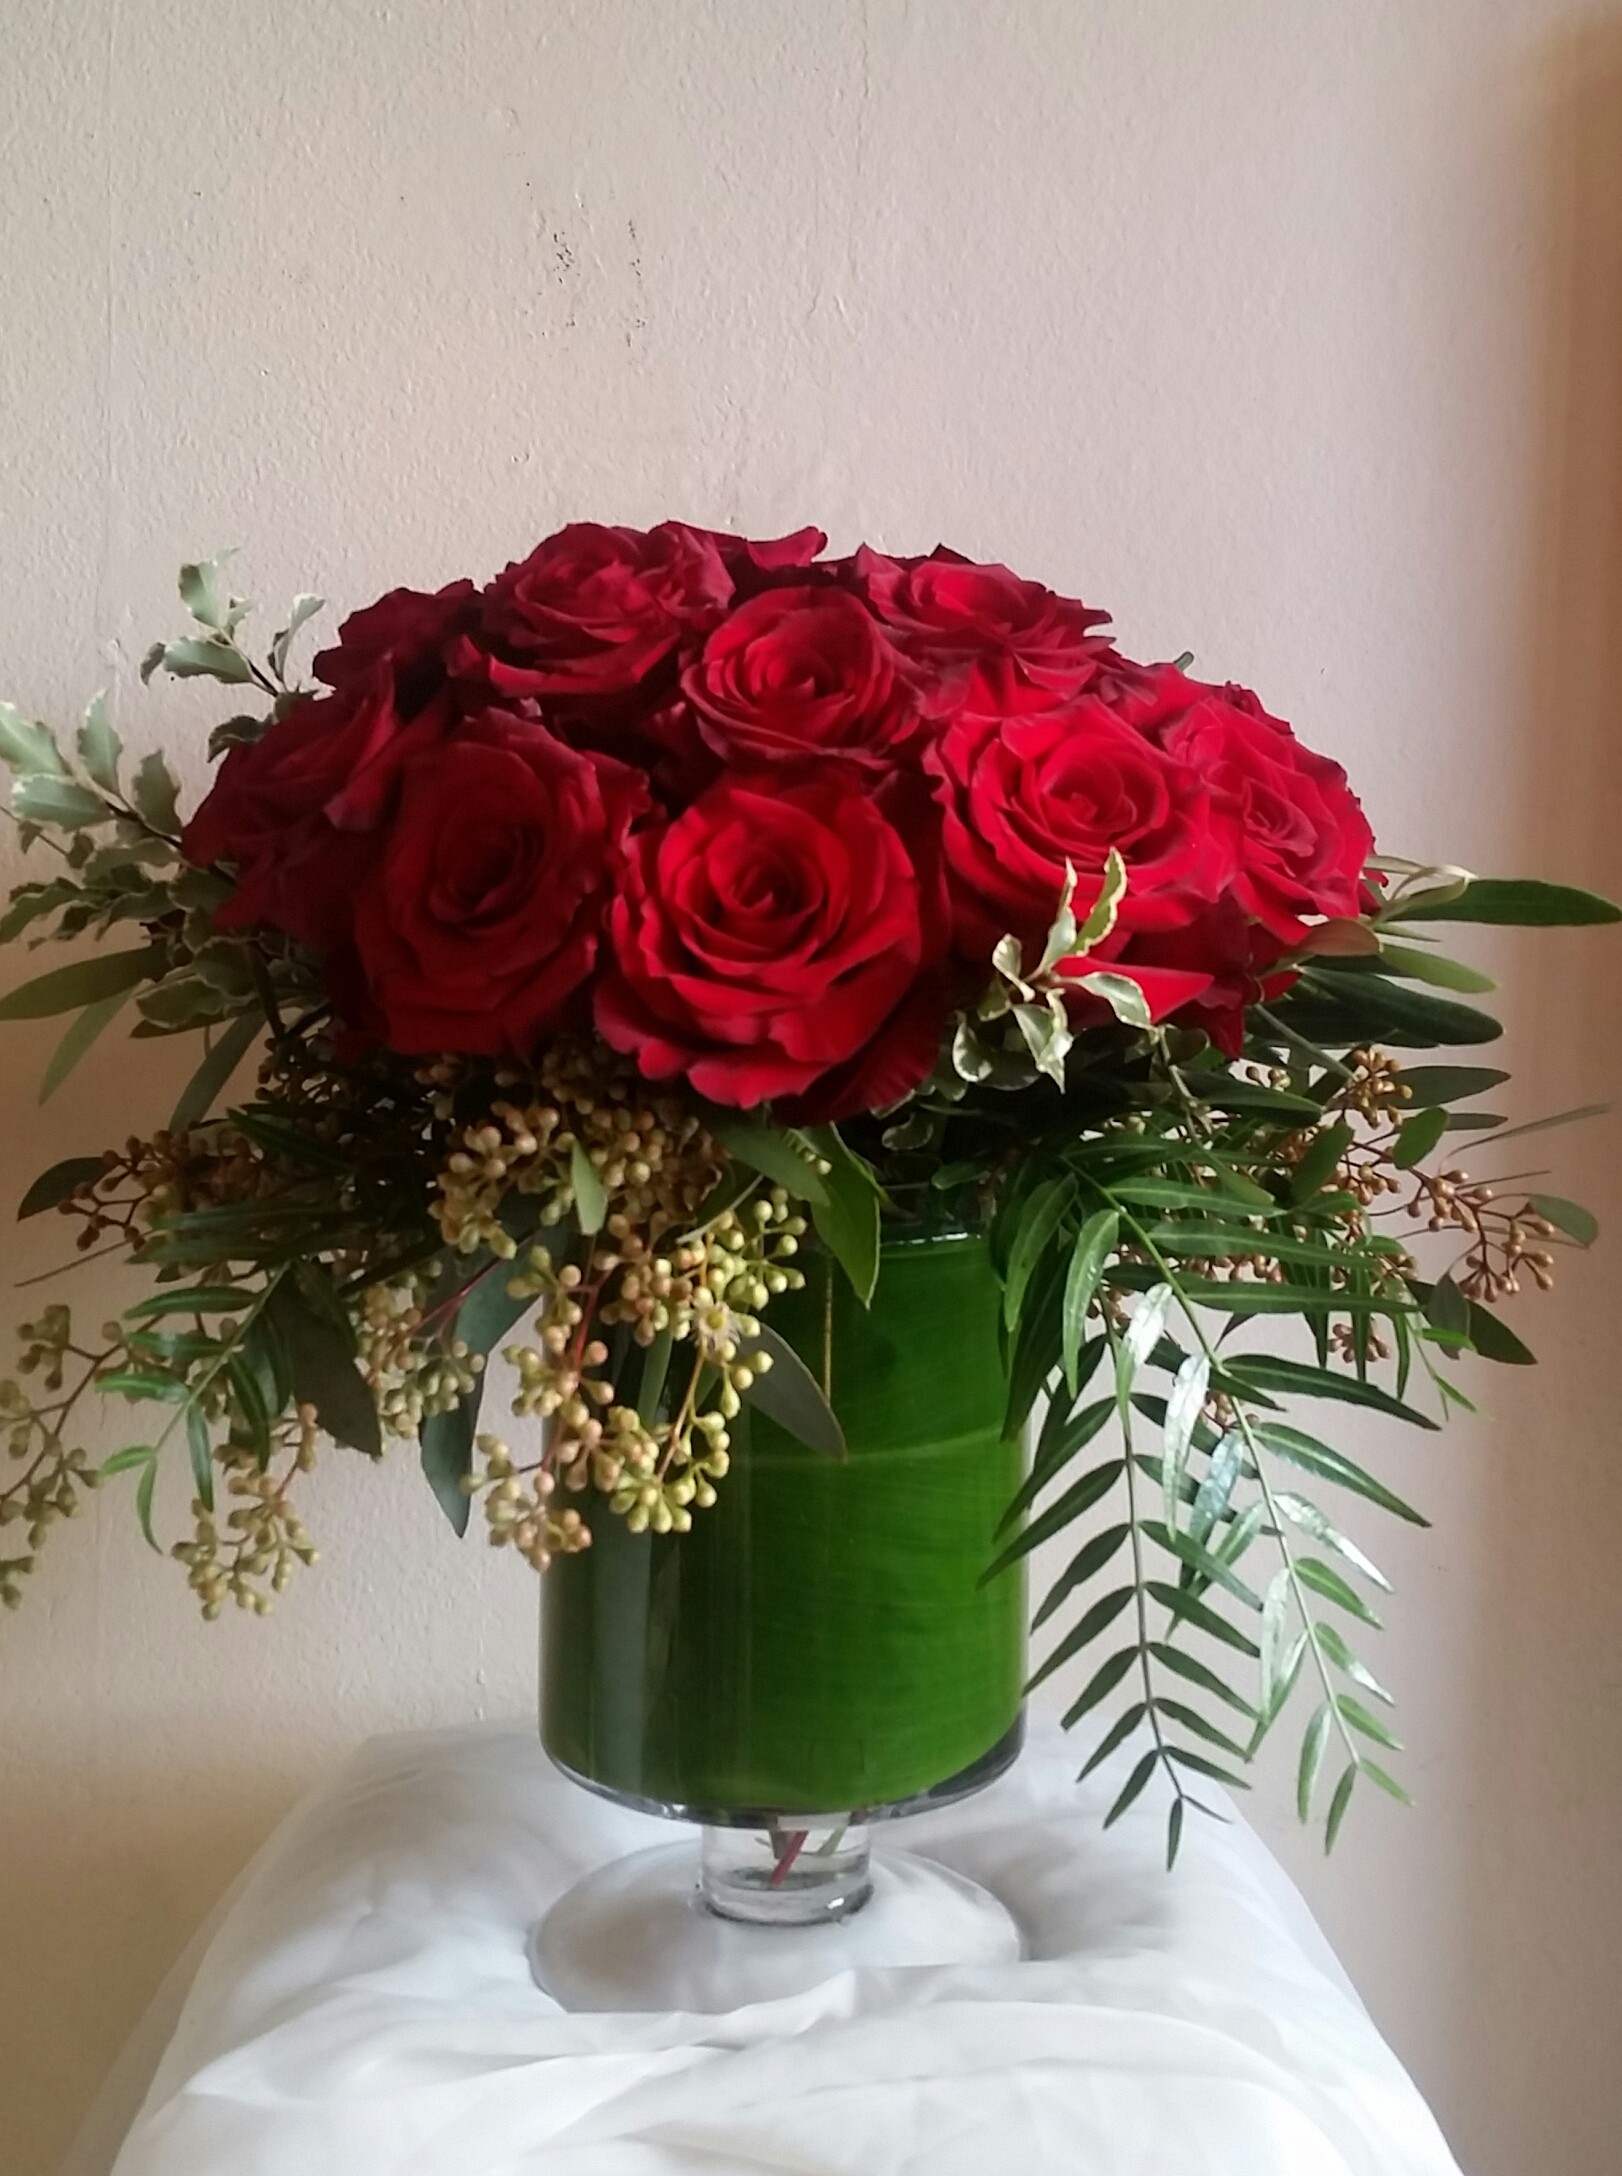 Lush Red Rose in Del Mar, CA | Jolie Fleur